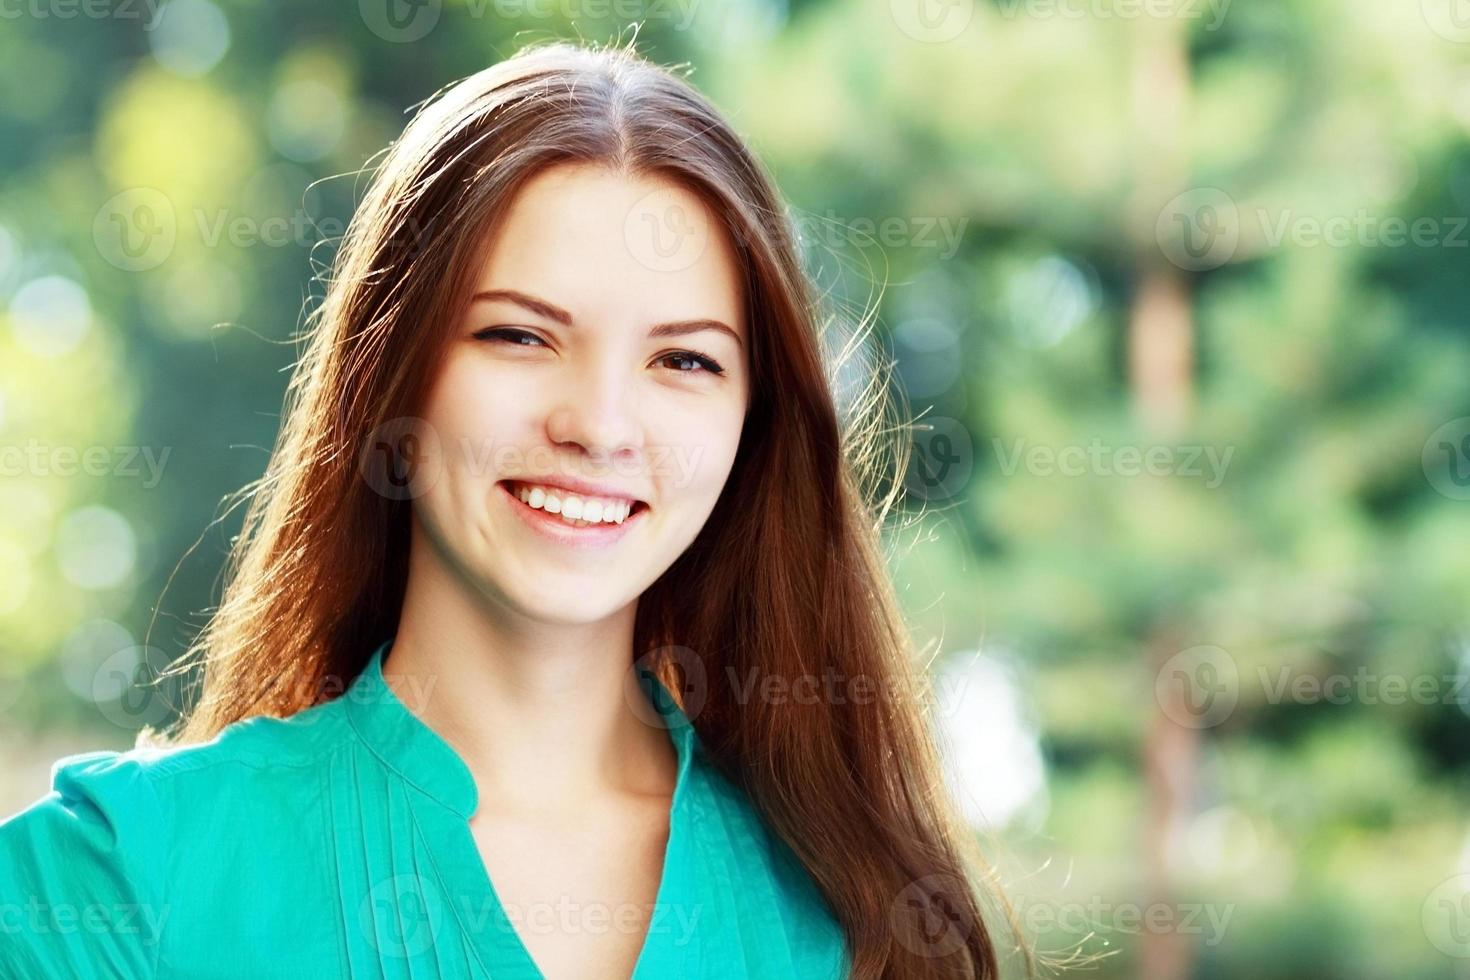 teenage girl looking photo